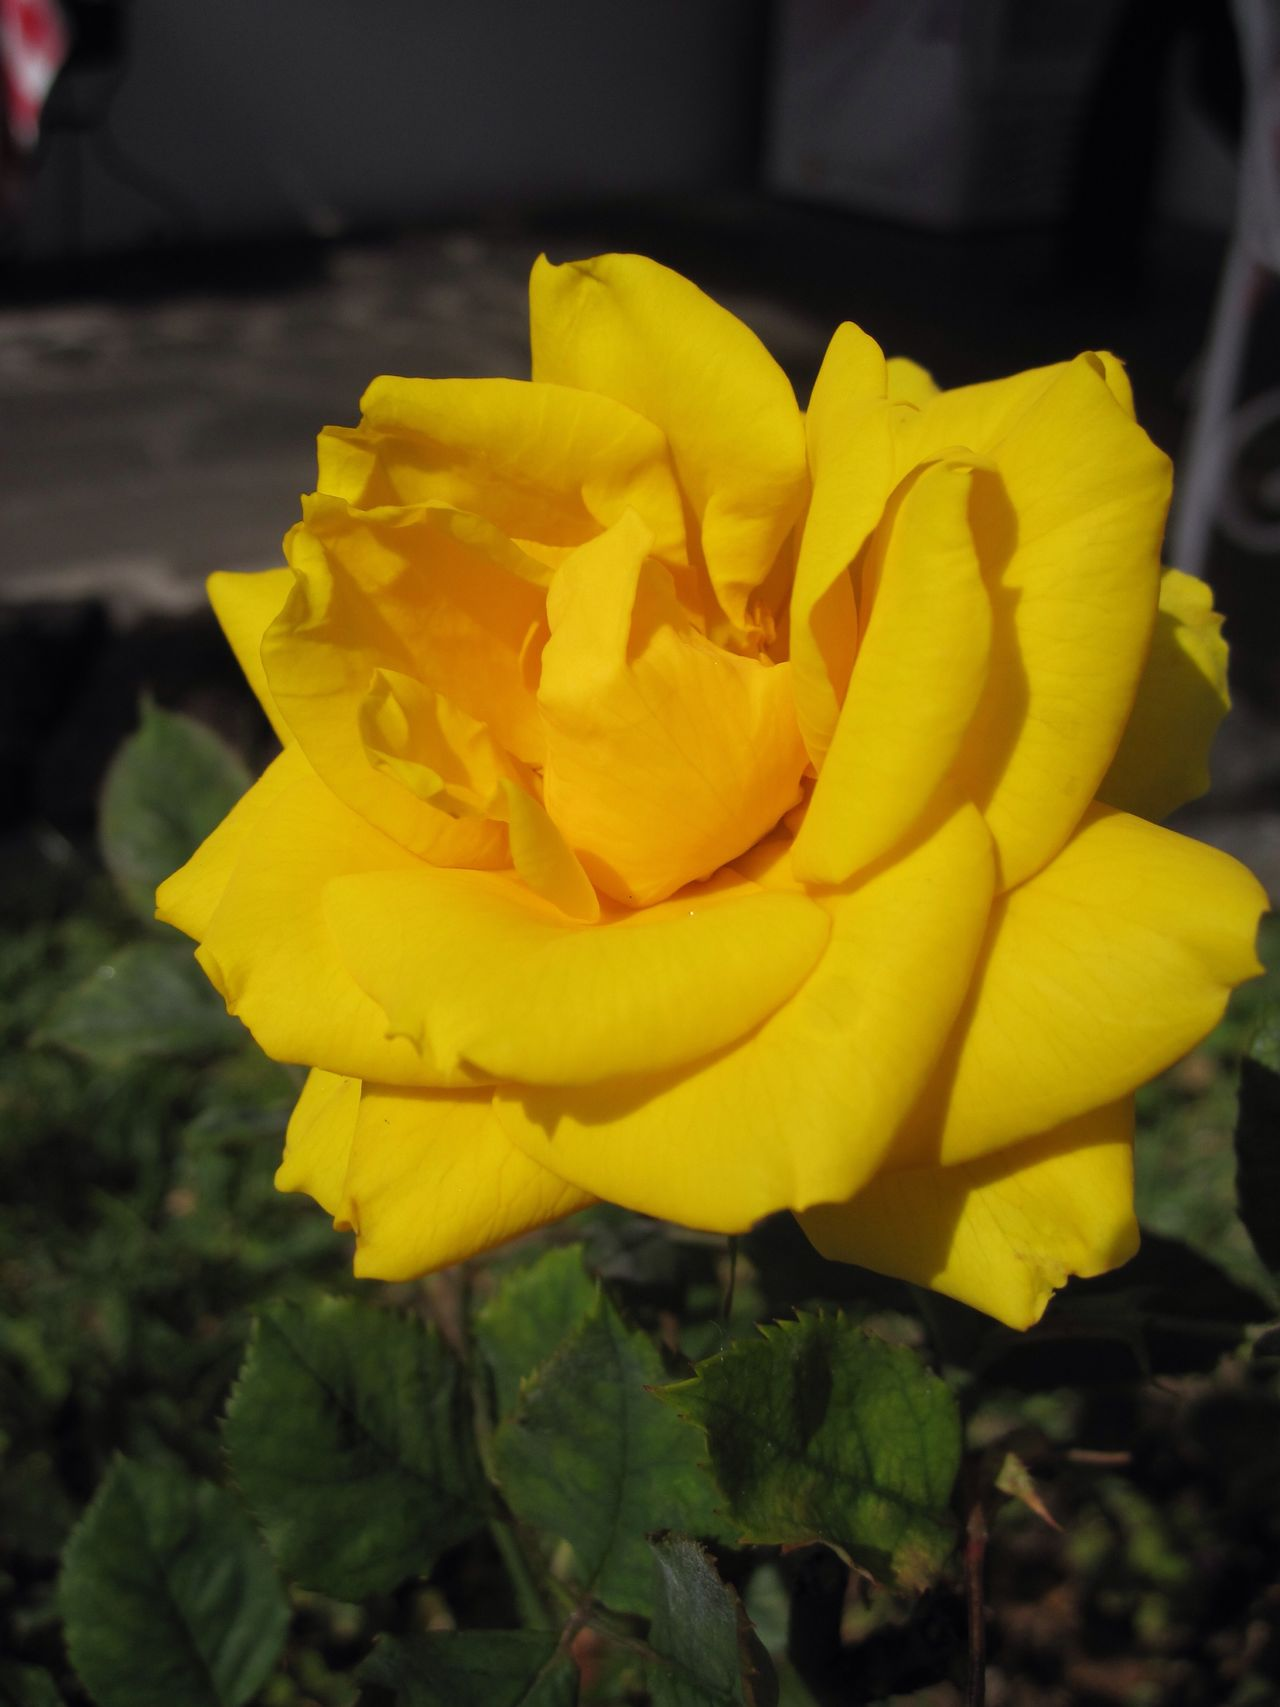 Yellow Yellow Flower Rose - Flower Roses Rose🌹 Yellow Rose Flower Flower Head